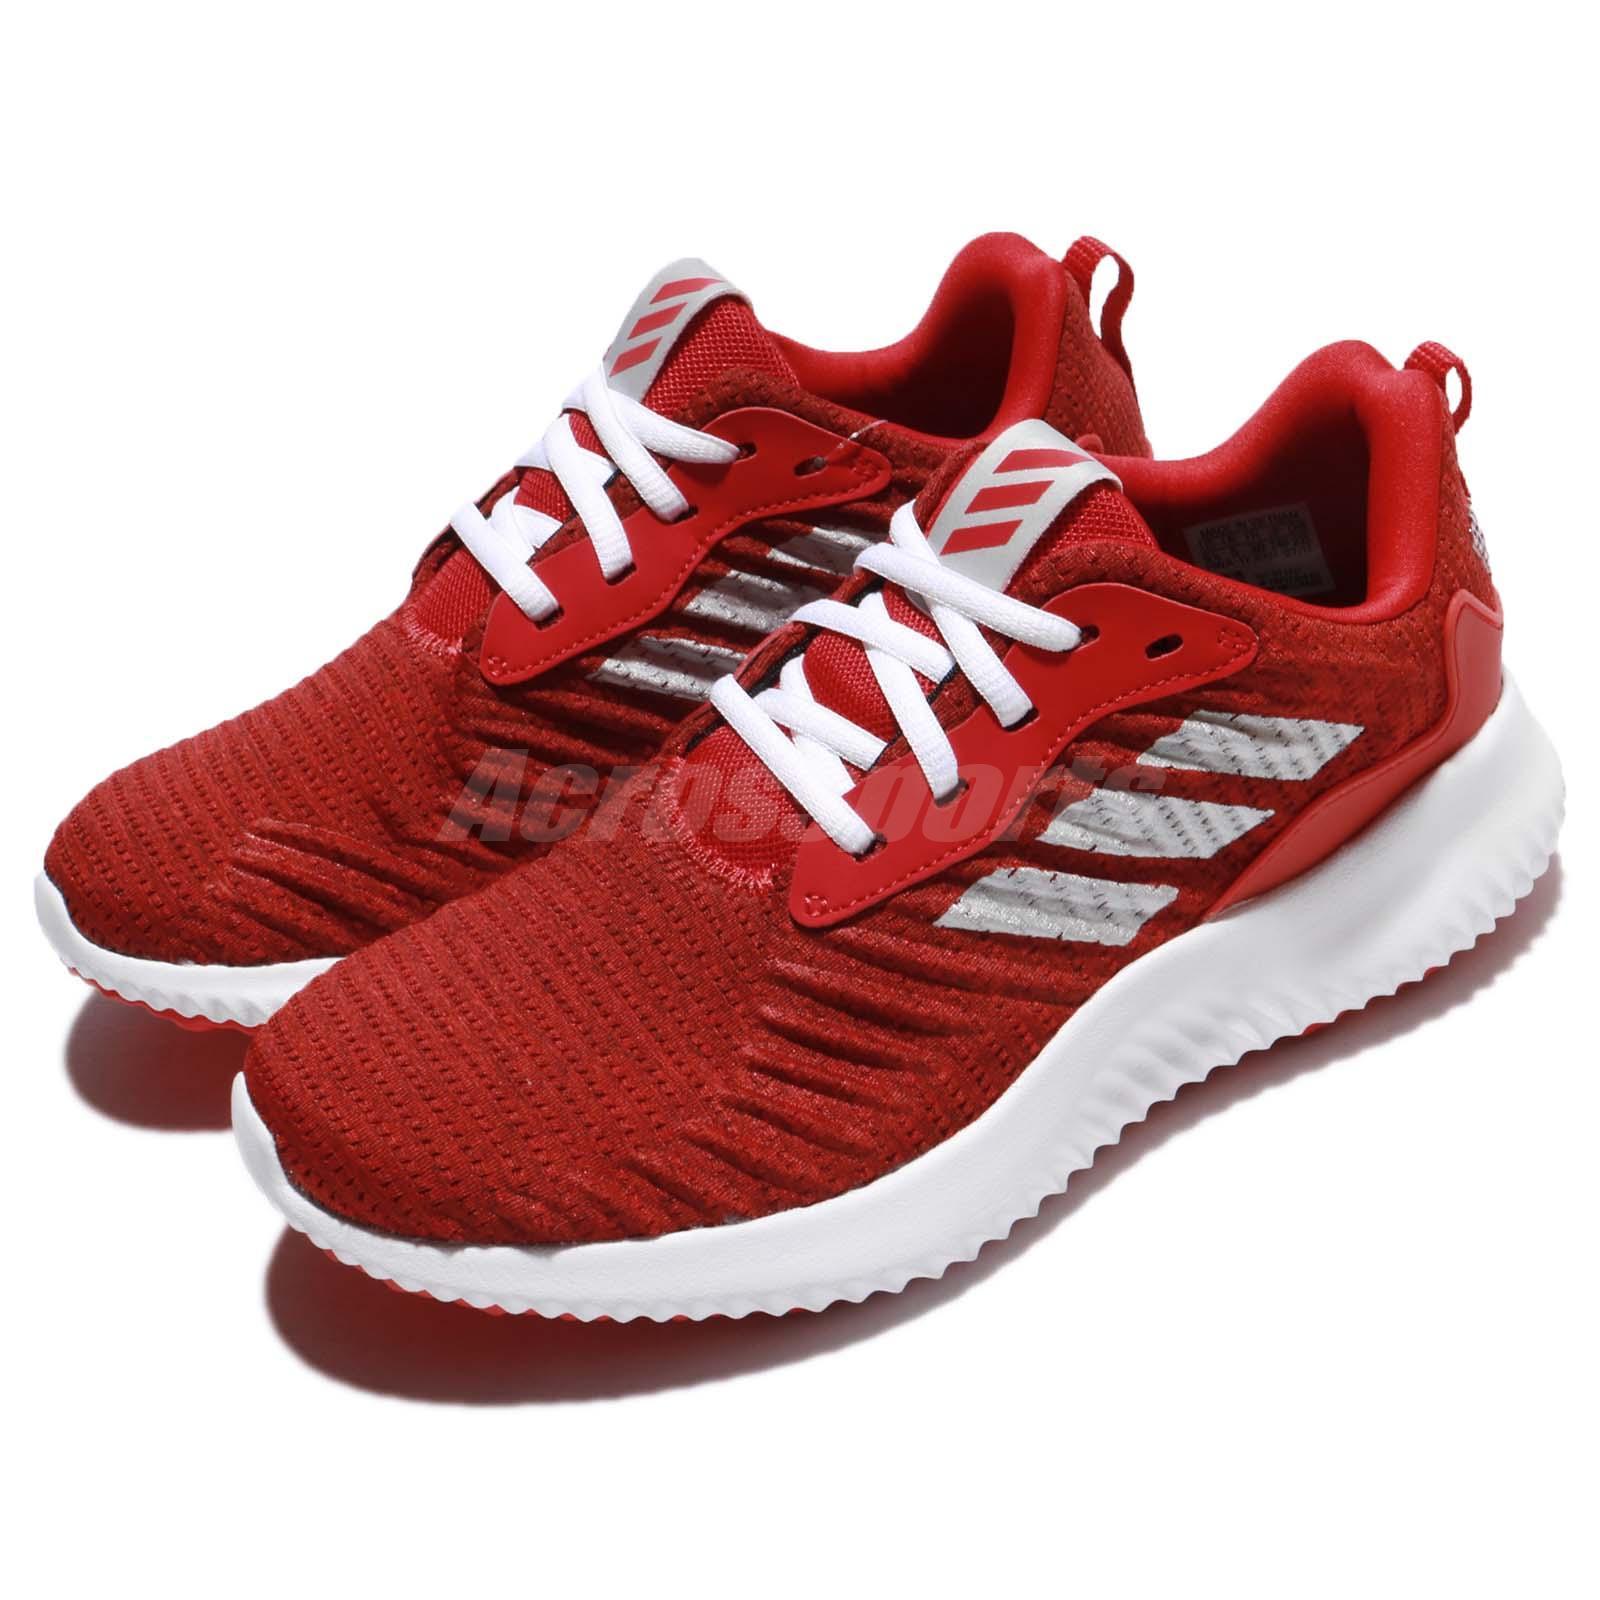 adidas alphabounce rc j rosso - bianco - argento figli junior donne in fuga